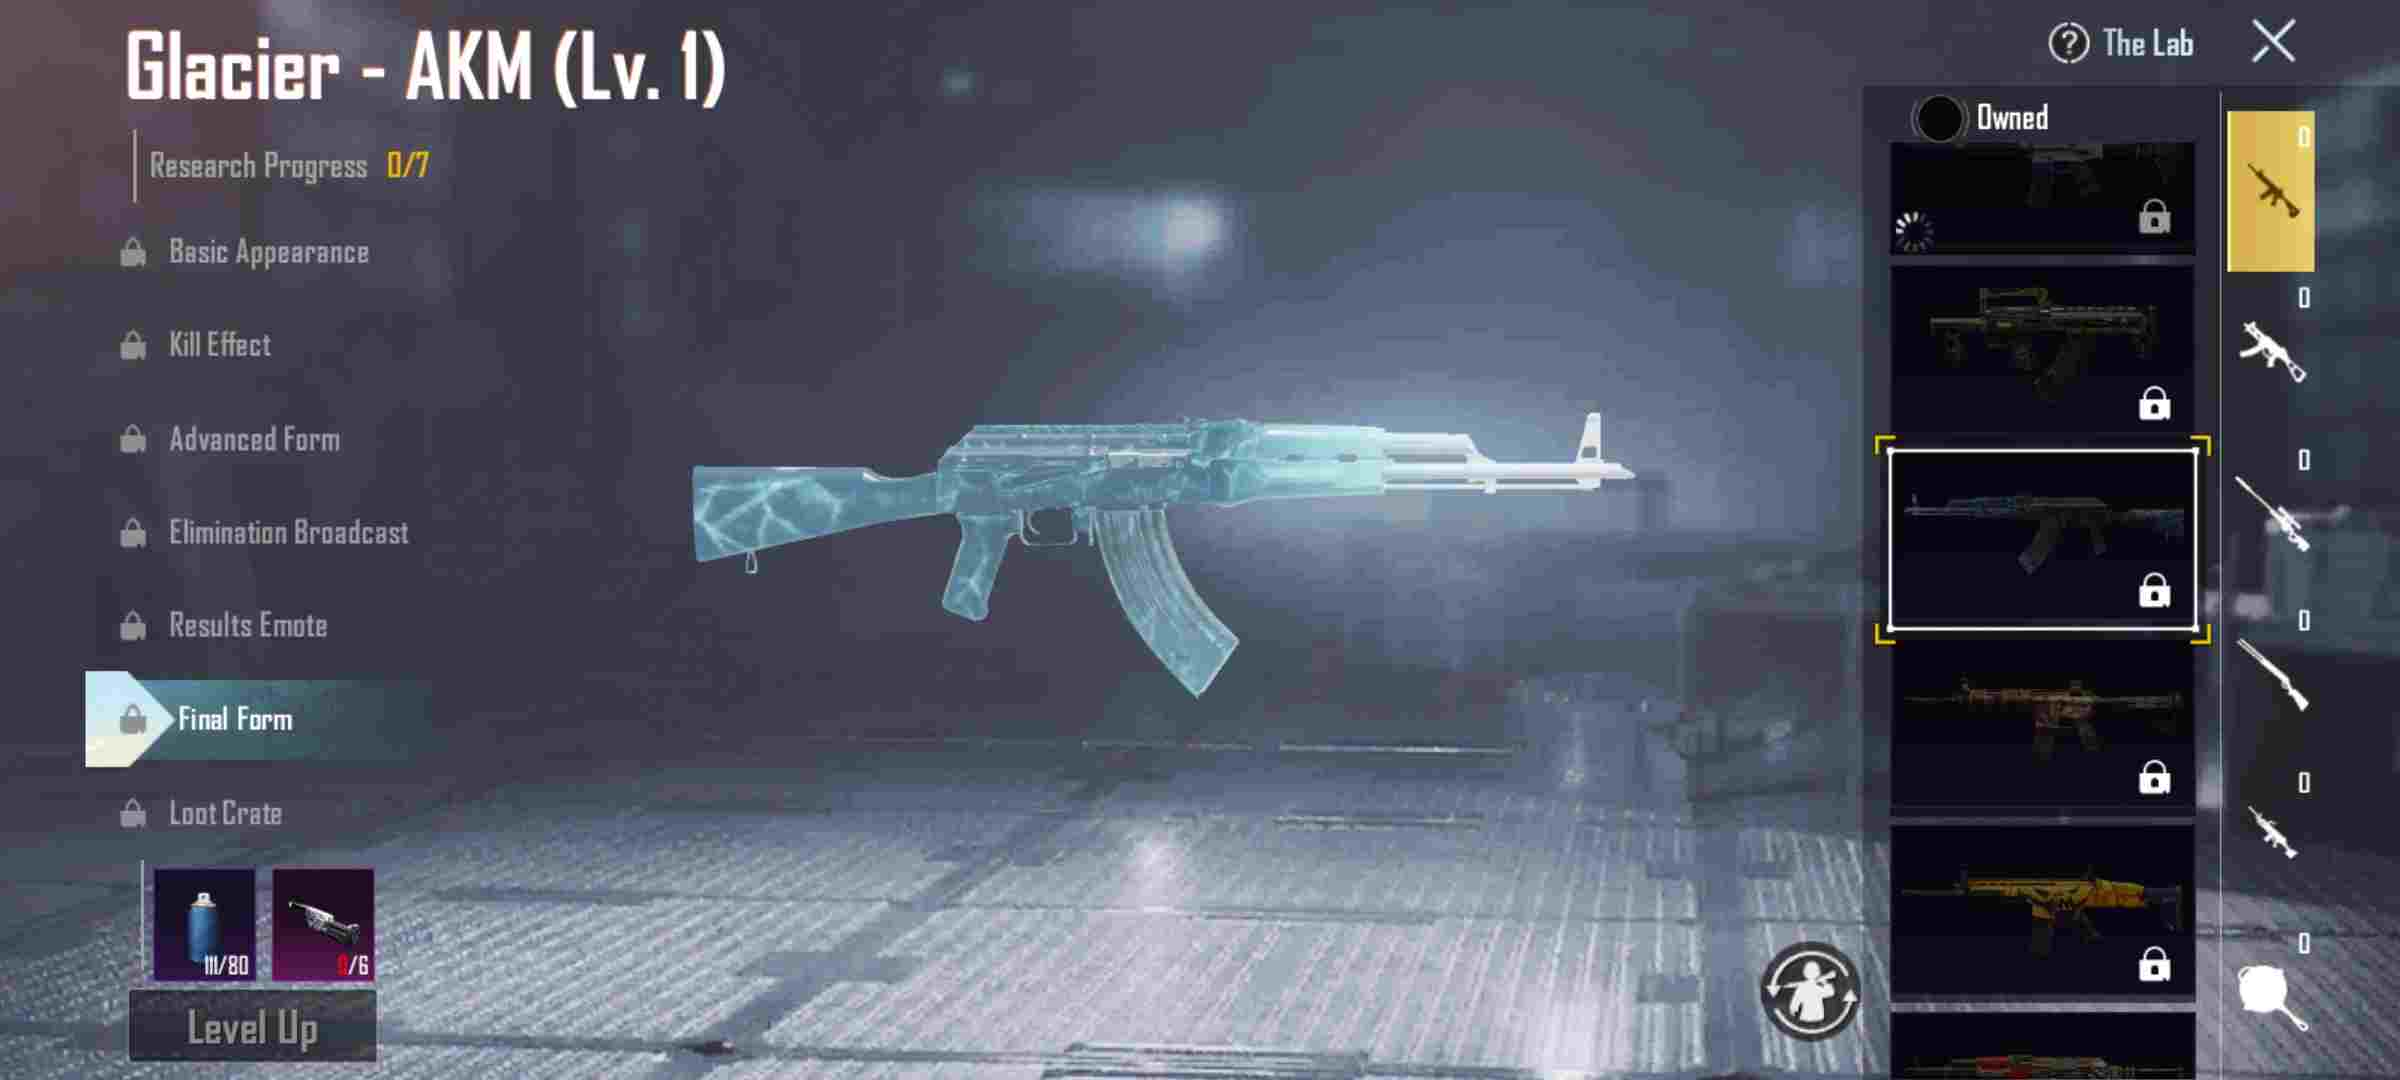 Top 10 Gun Skins in PUBG Mobile: Glacier – AKM